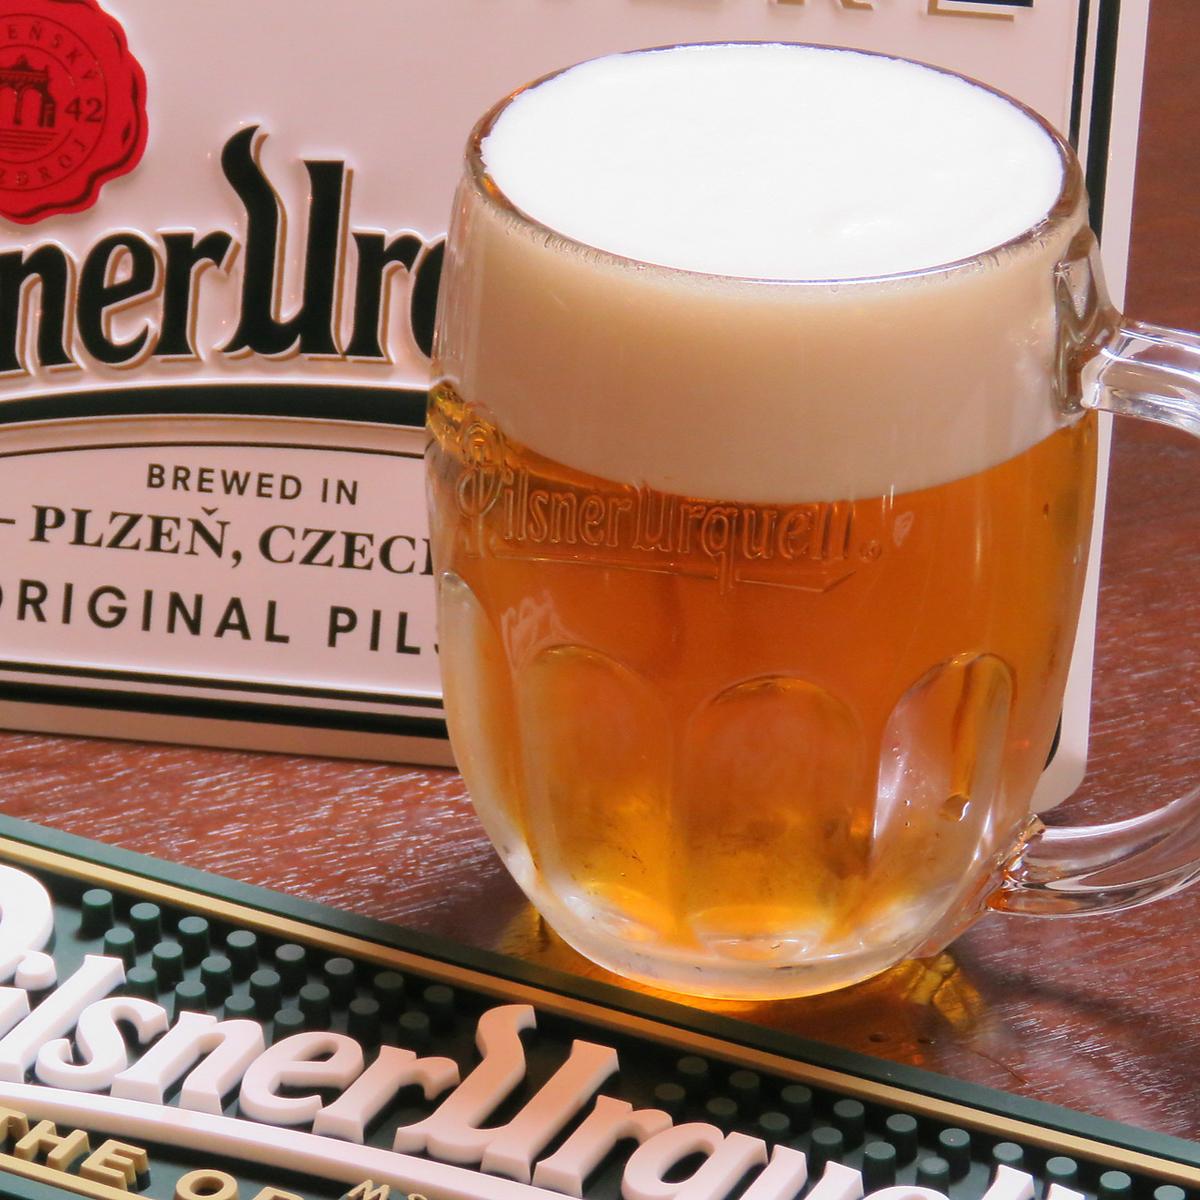 【Urquell】Origin Pilsner出生于捷克共和国